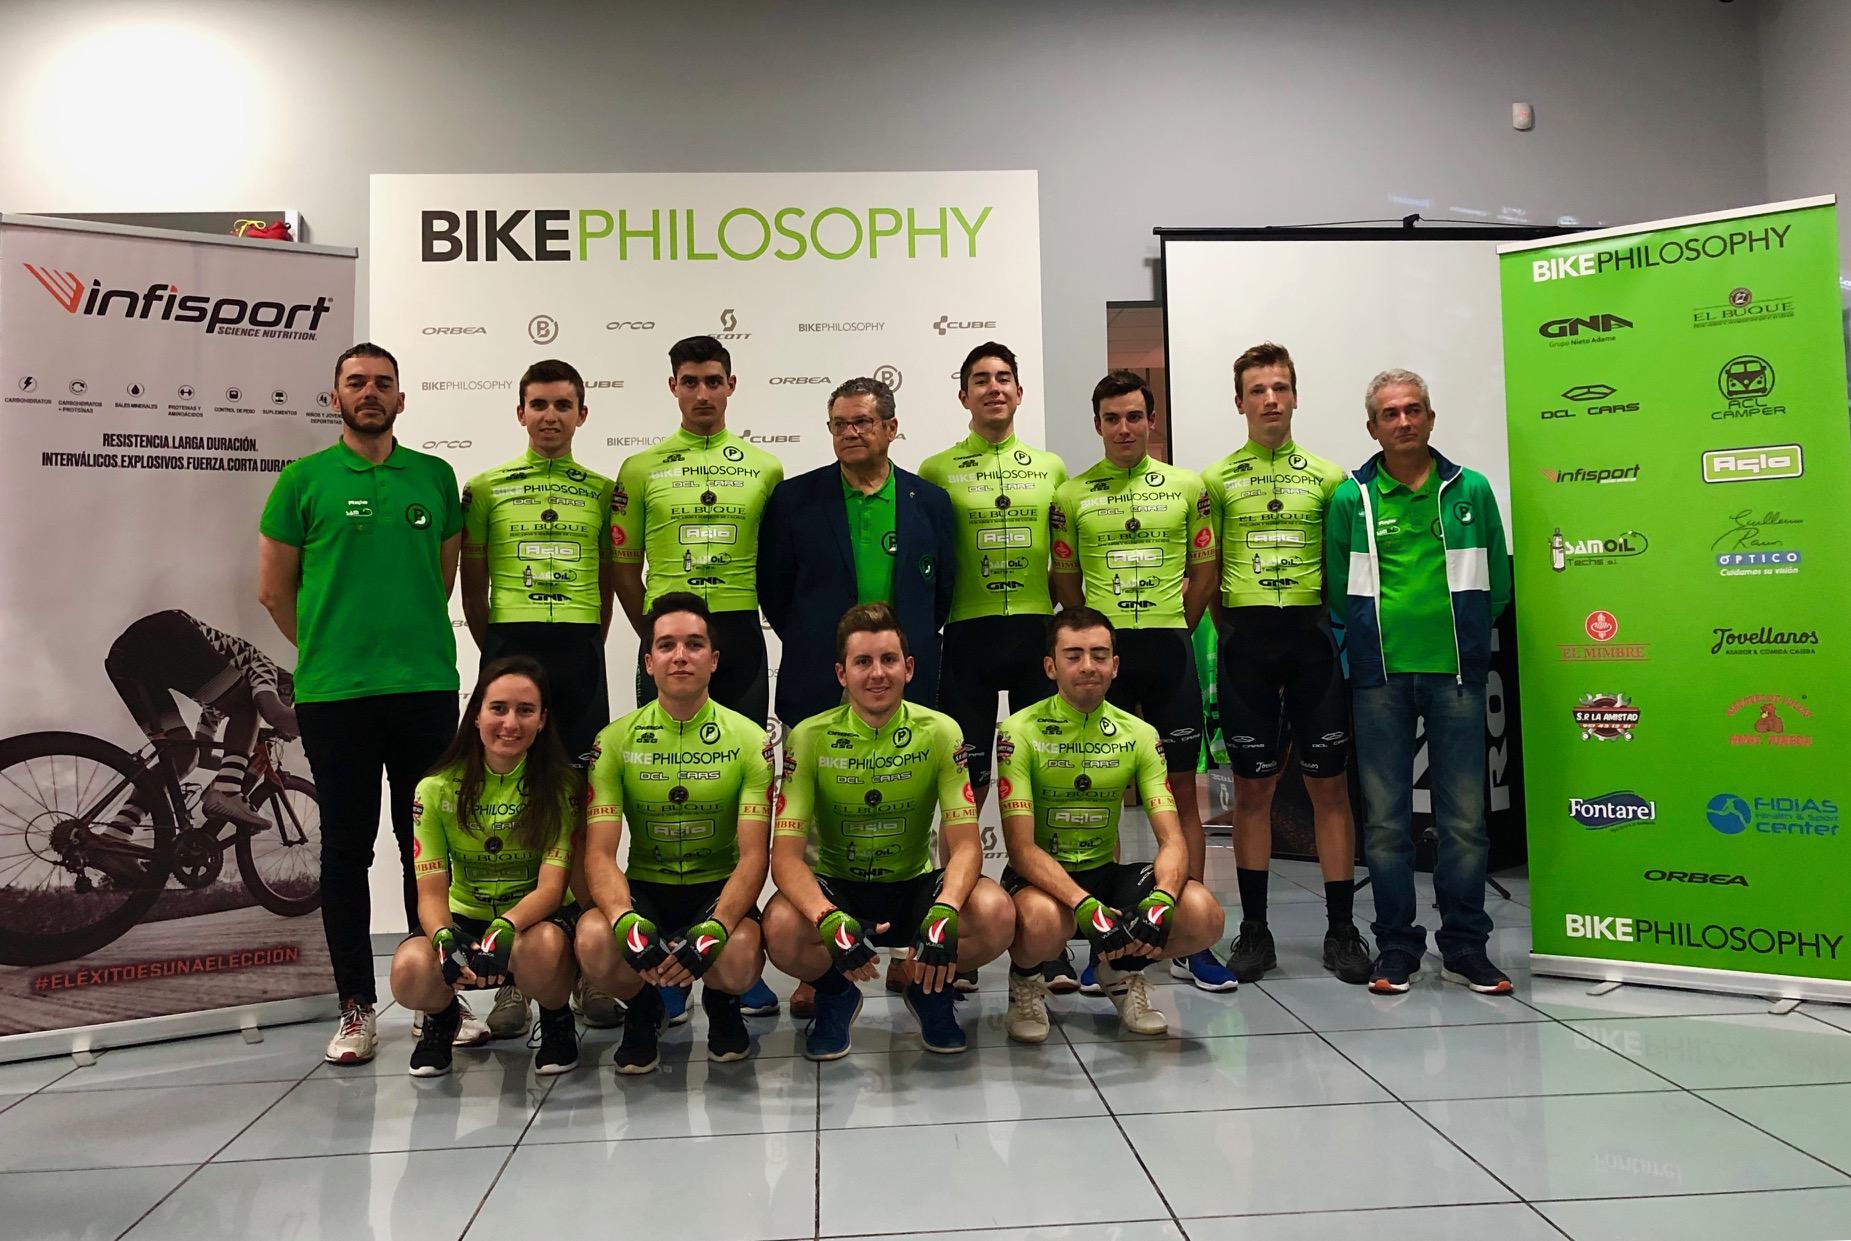 Bikephilosophy Team